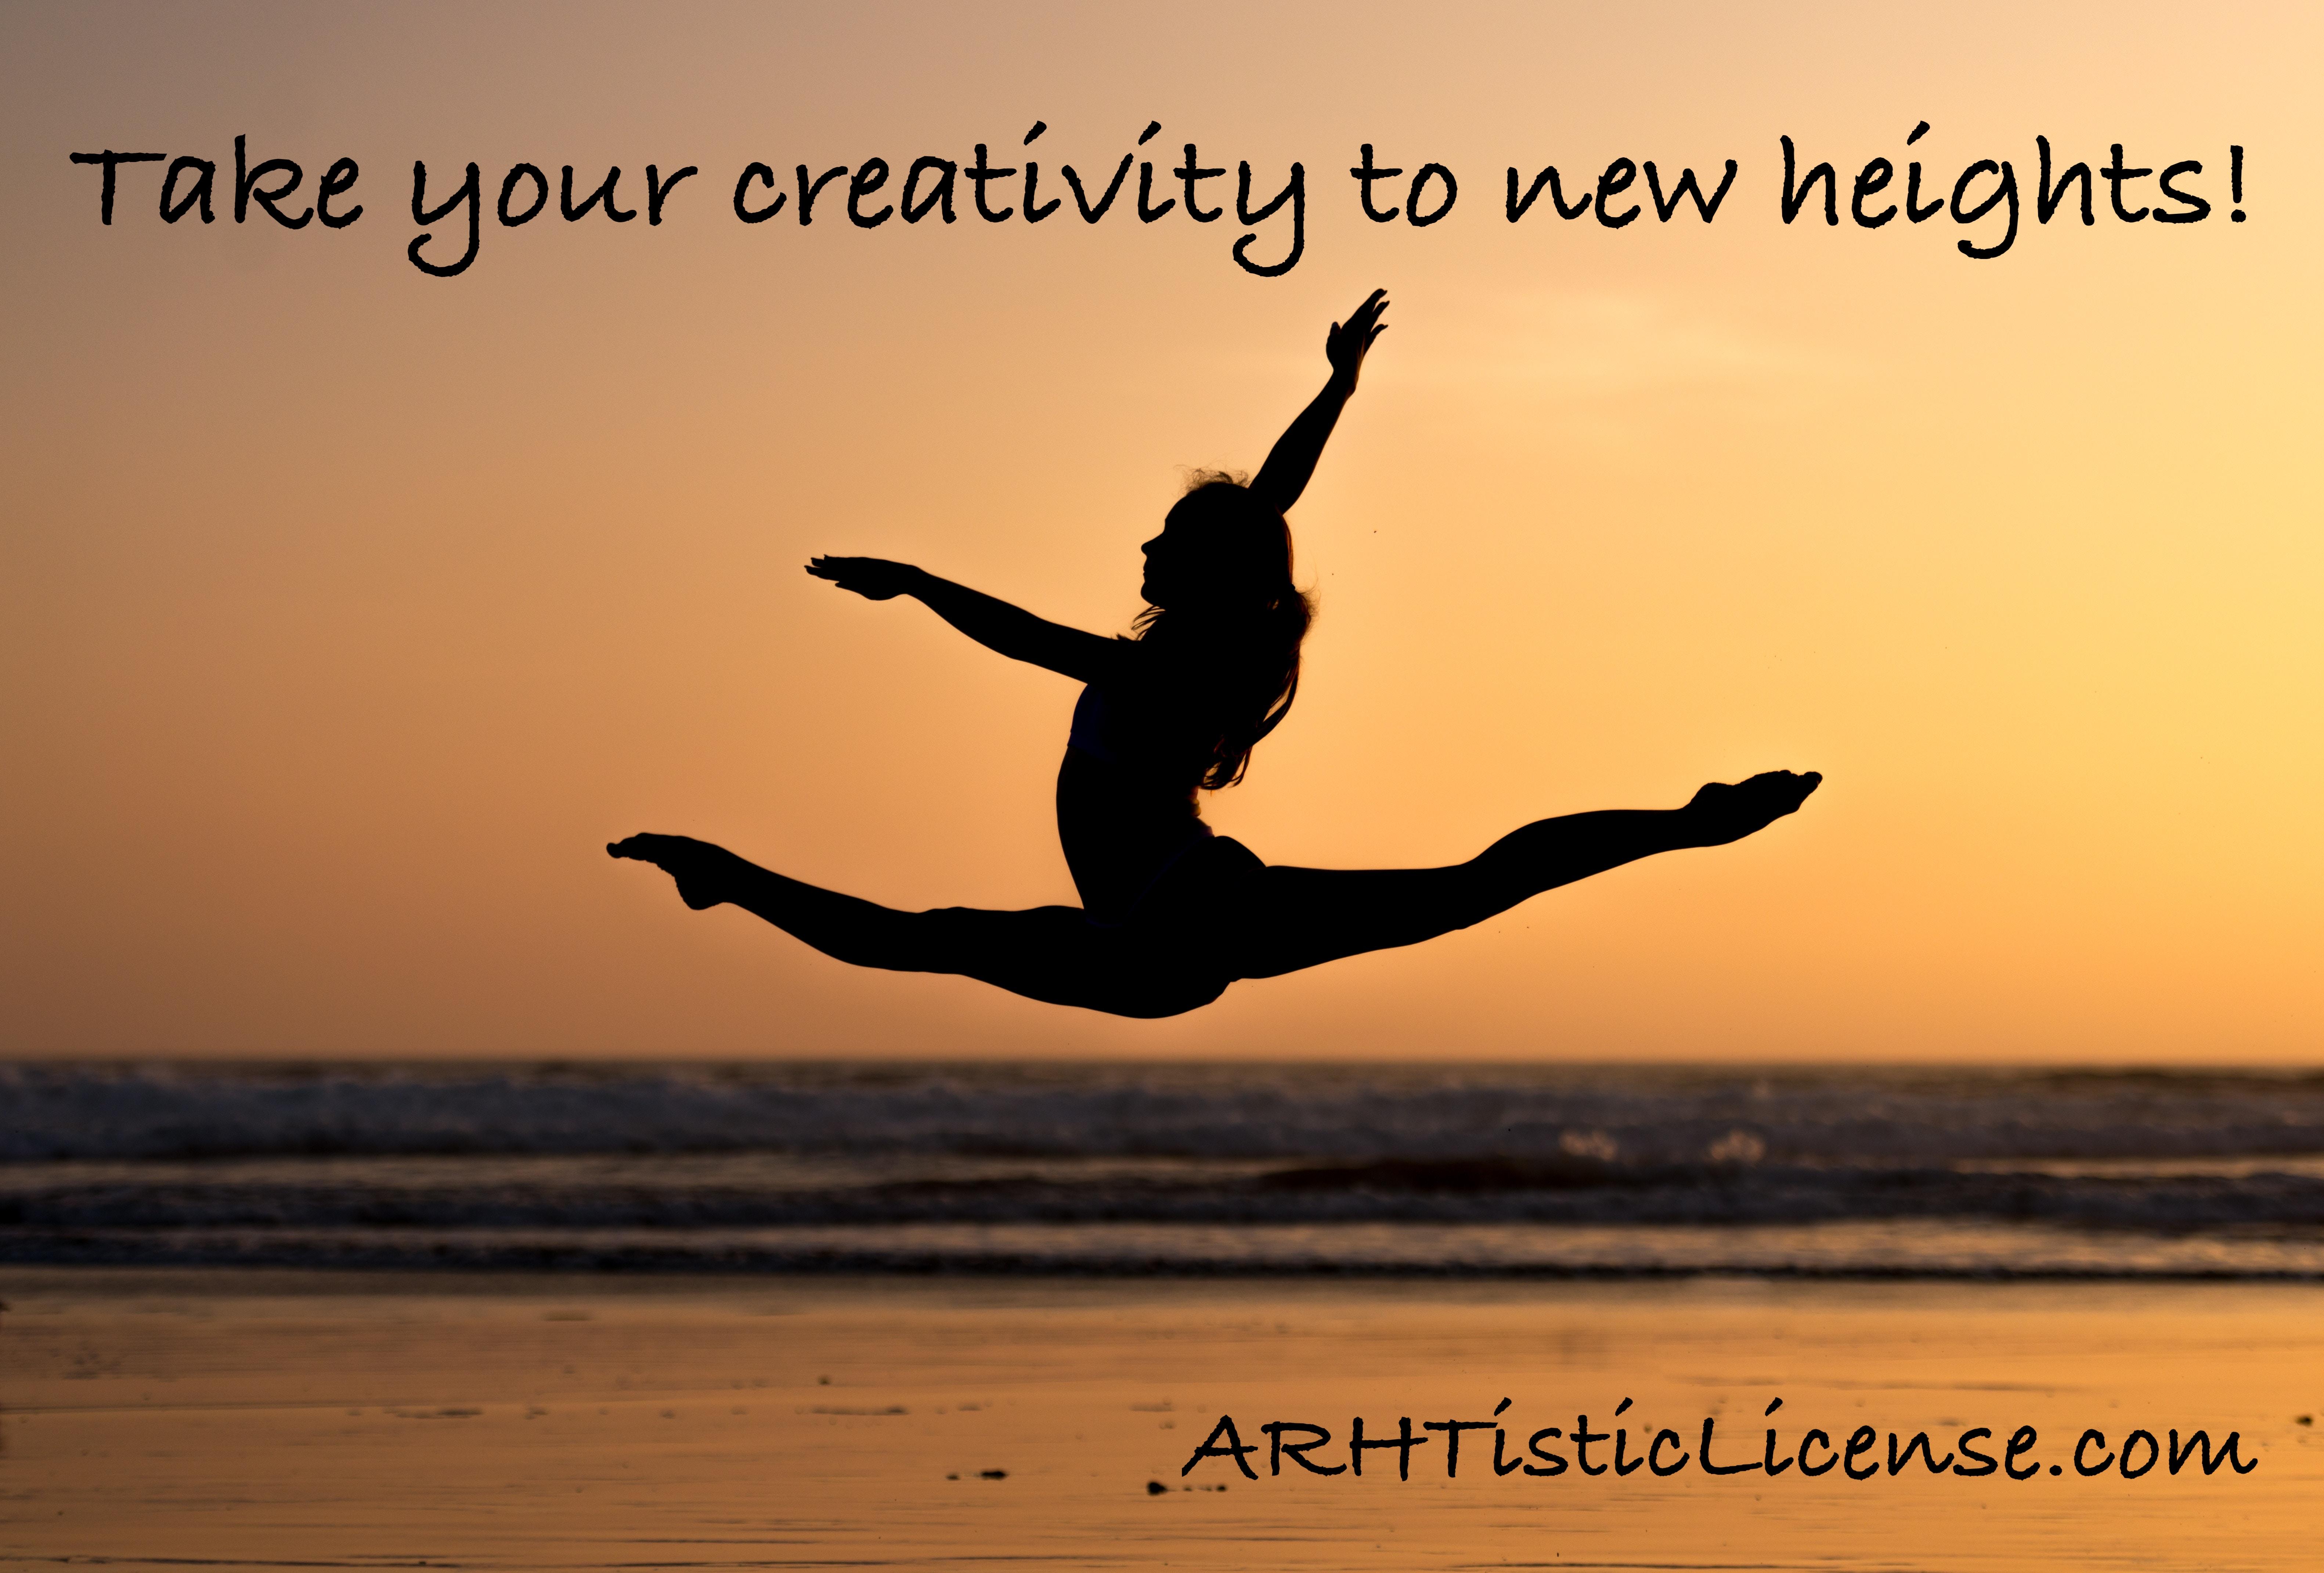 Take creativity